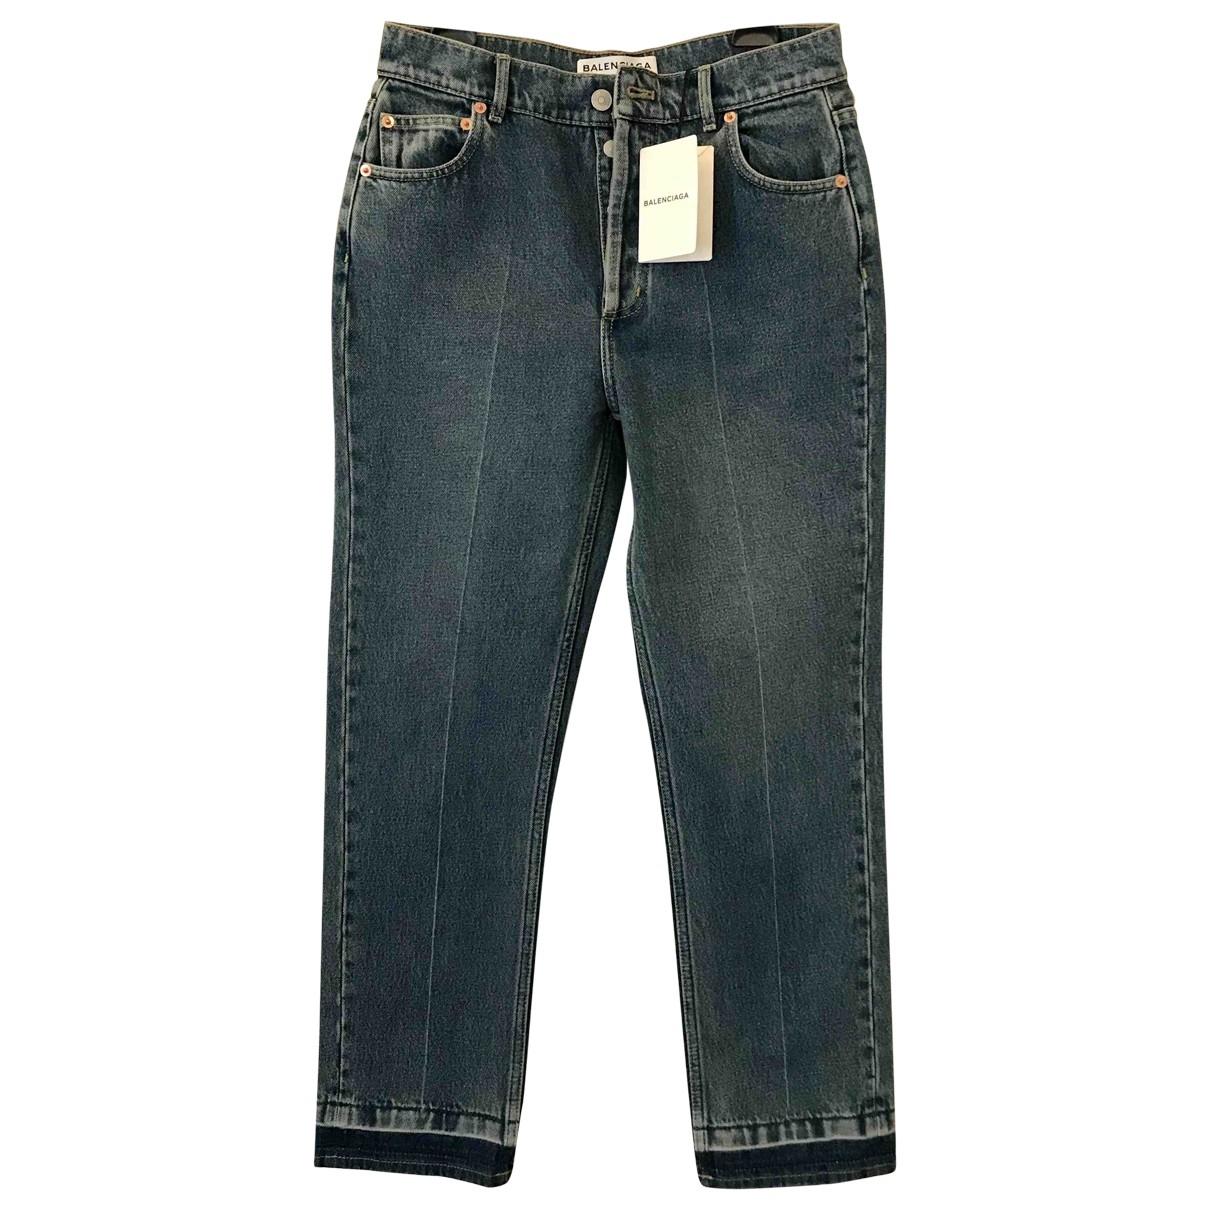 Balenciaga \N Blue Denim - Jeans Jeans for Women 28 US